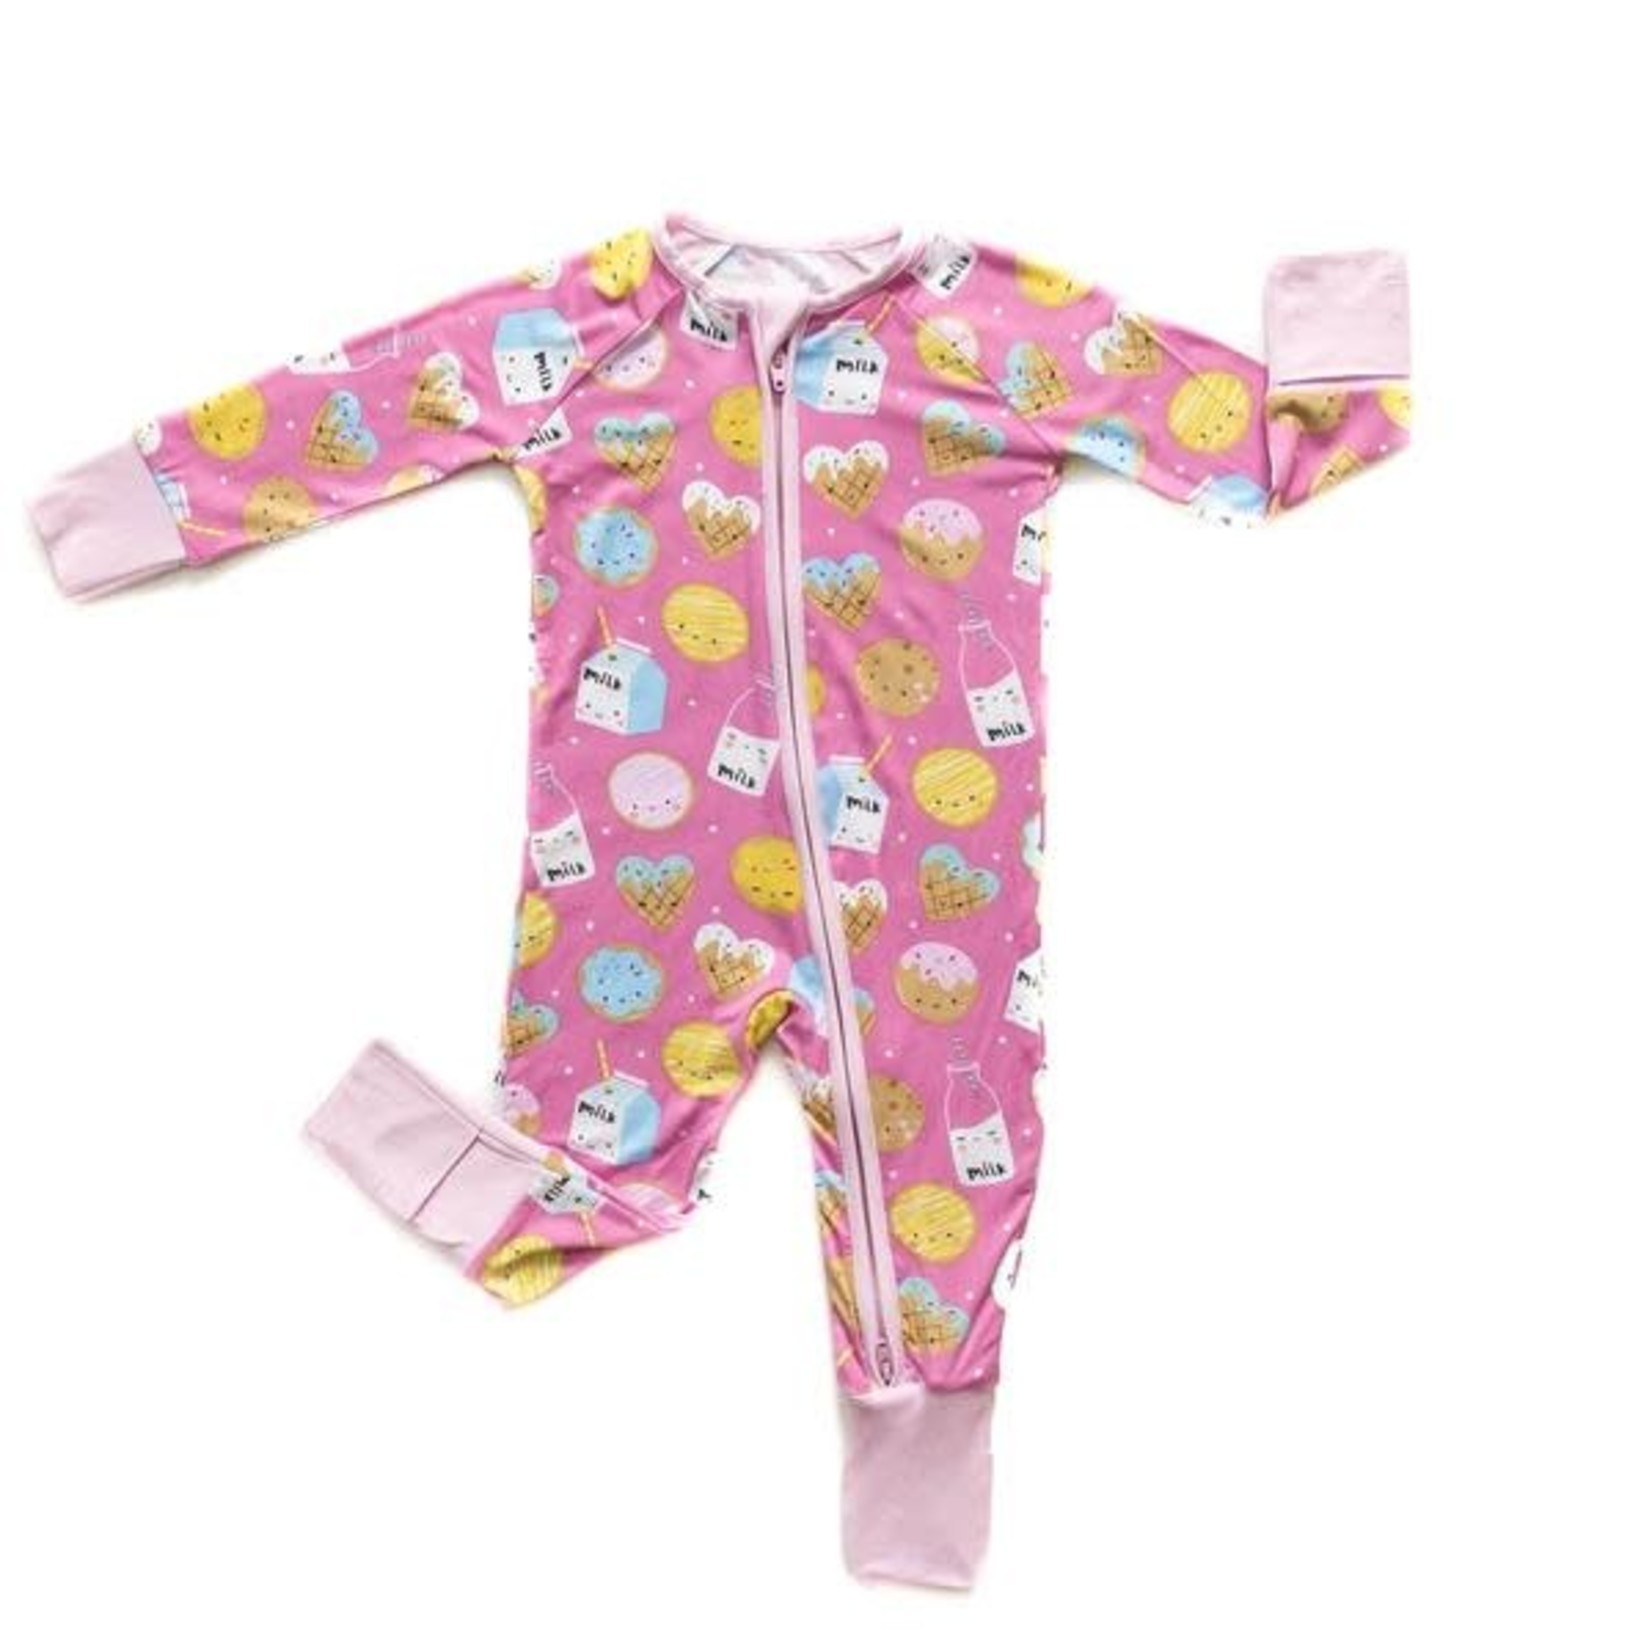 Little Sleepies Convertible Romper/Sleeper Cookies & Milk Pink